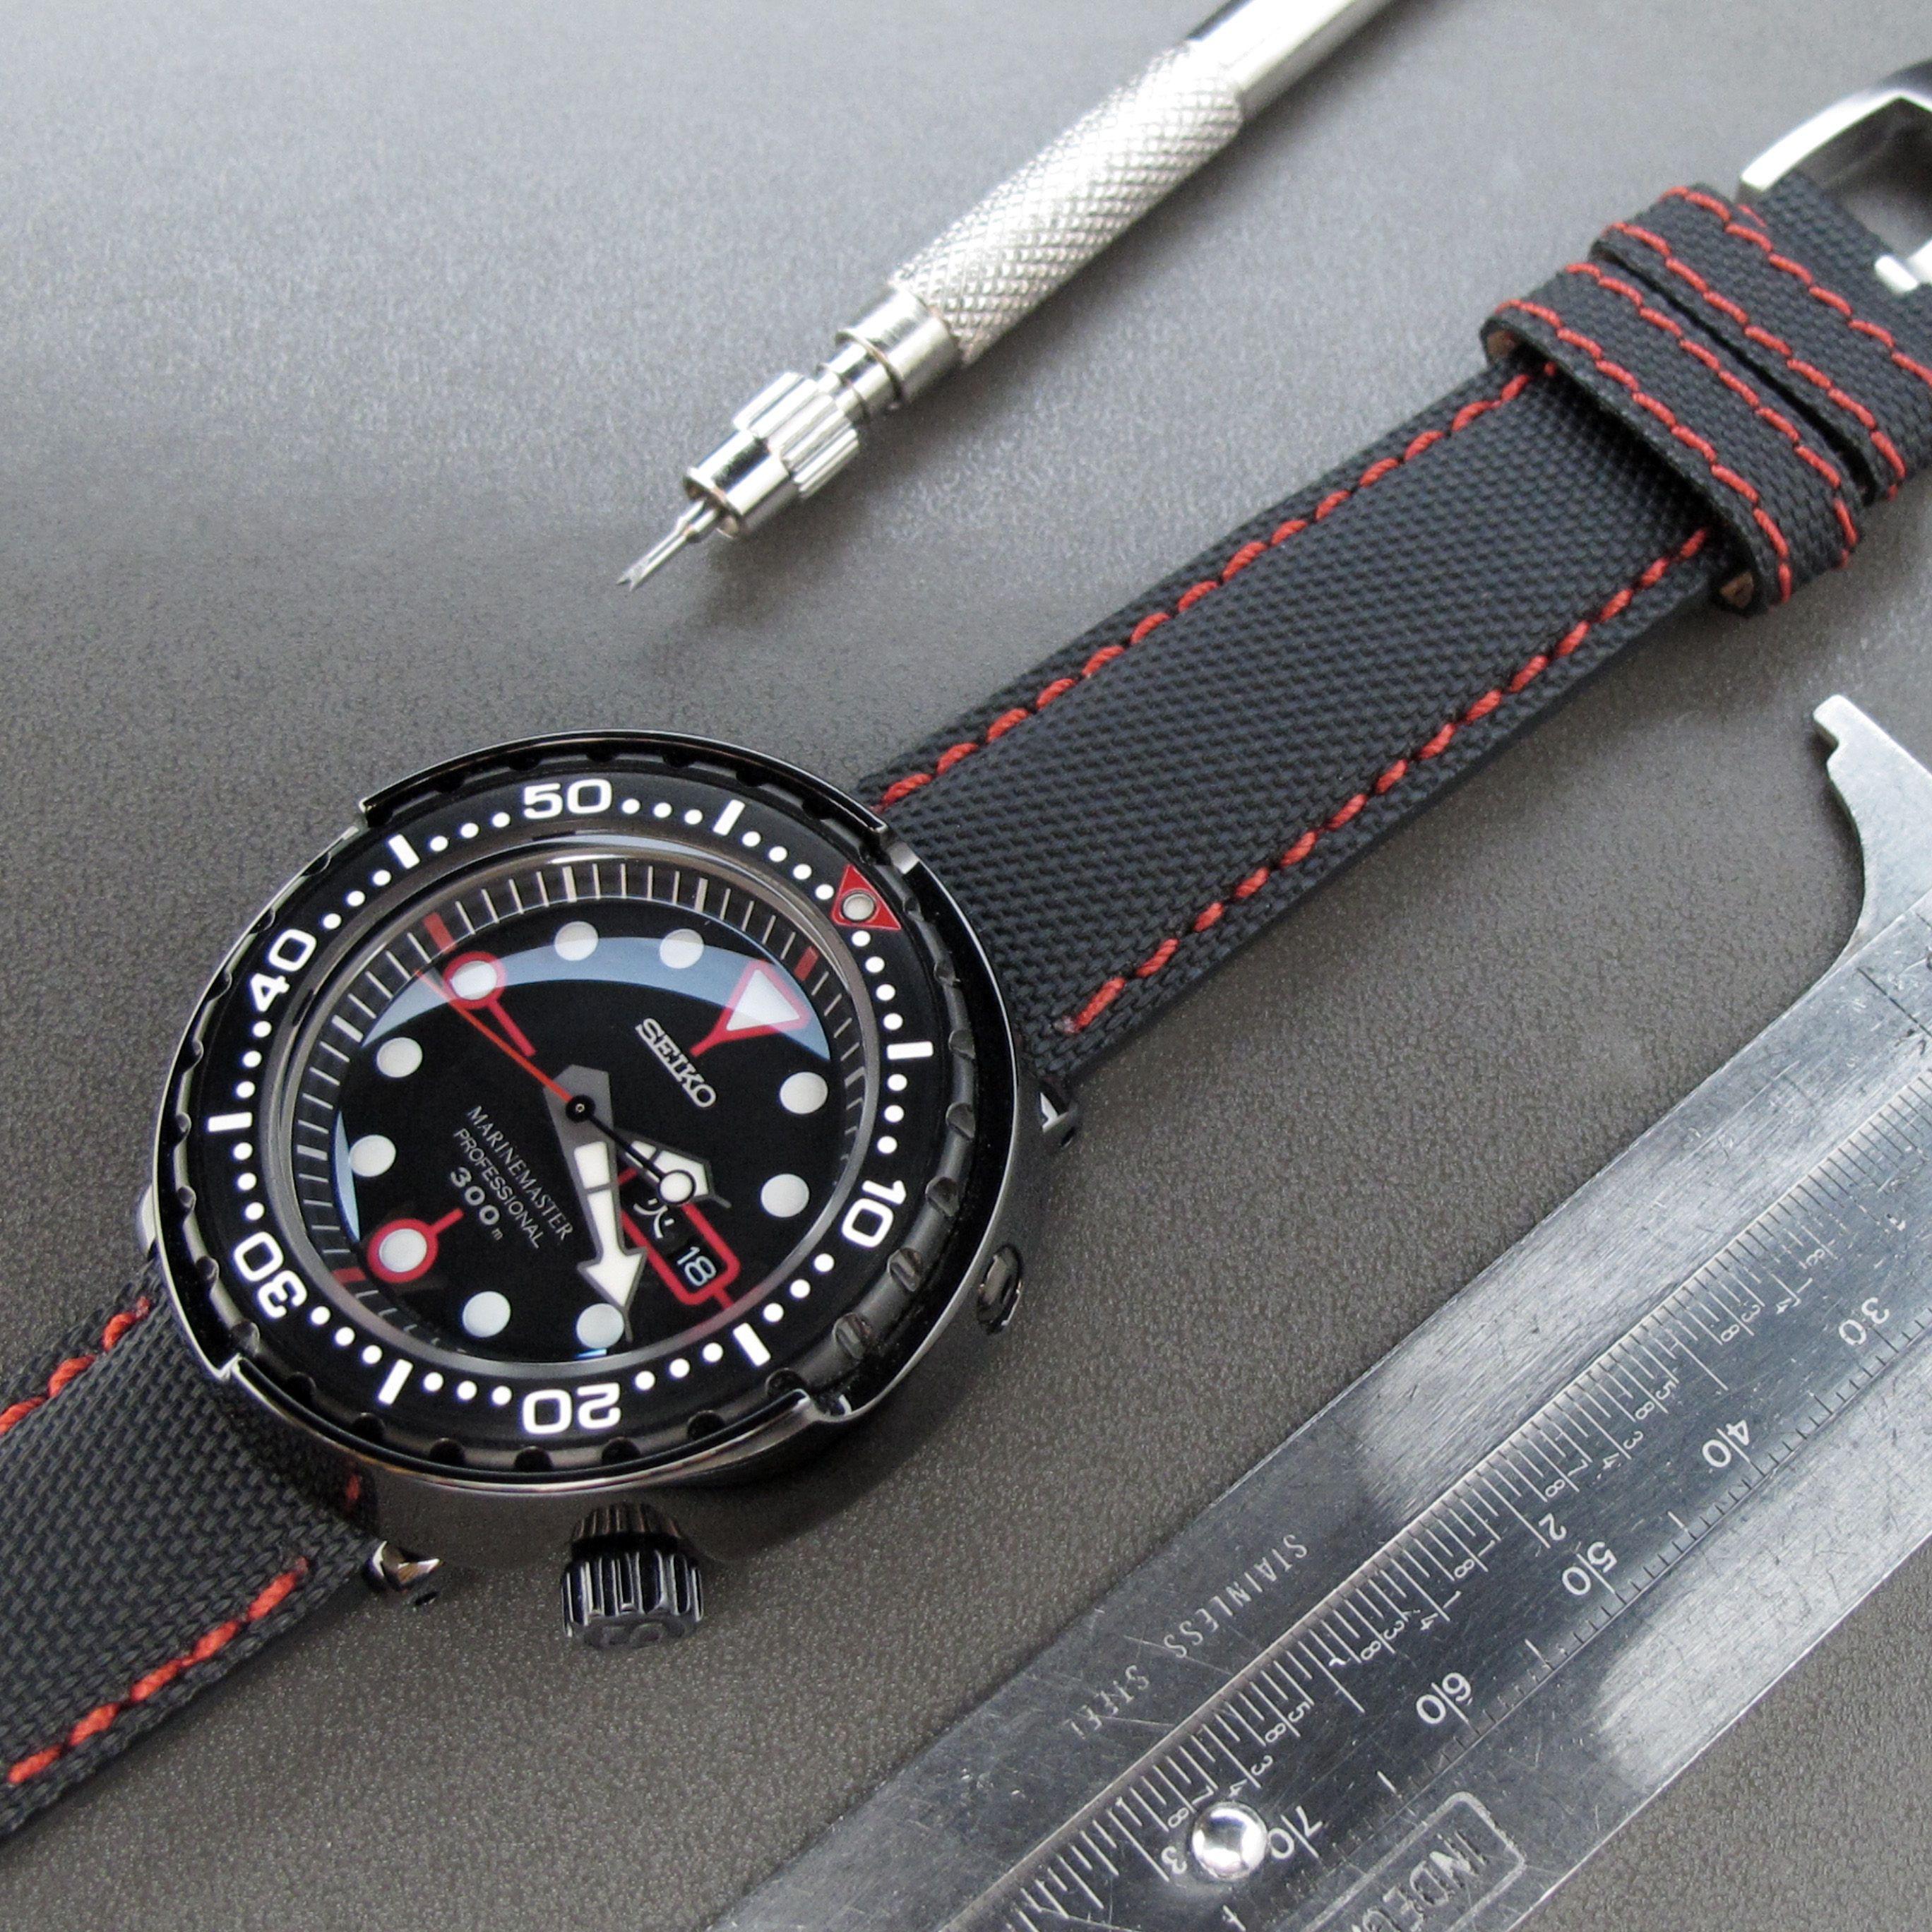 22mm Miltat Kevlar Watch Strap In Red